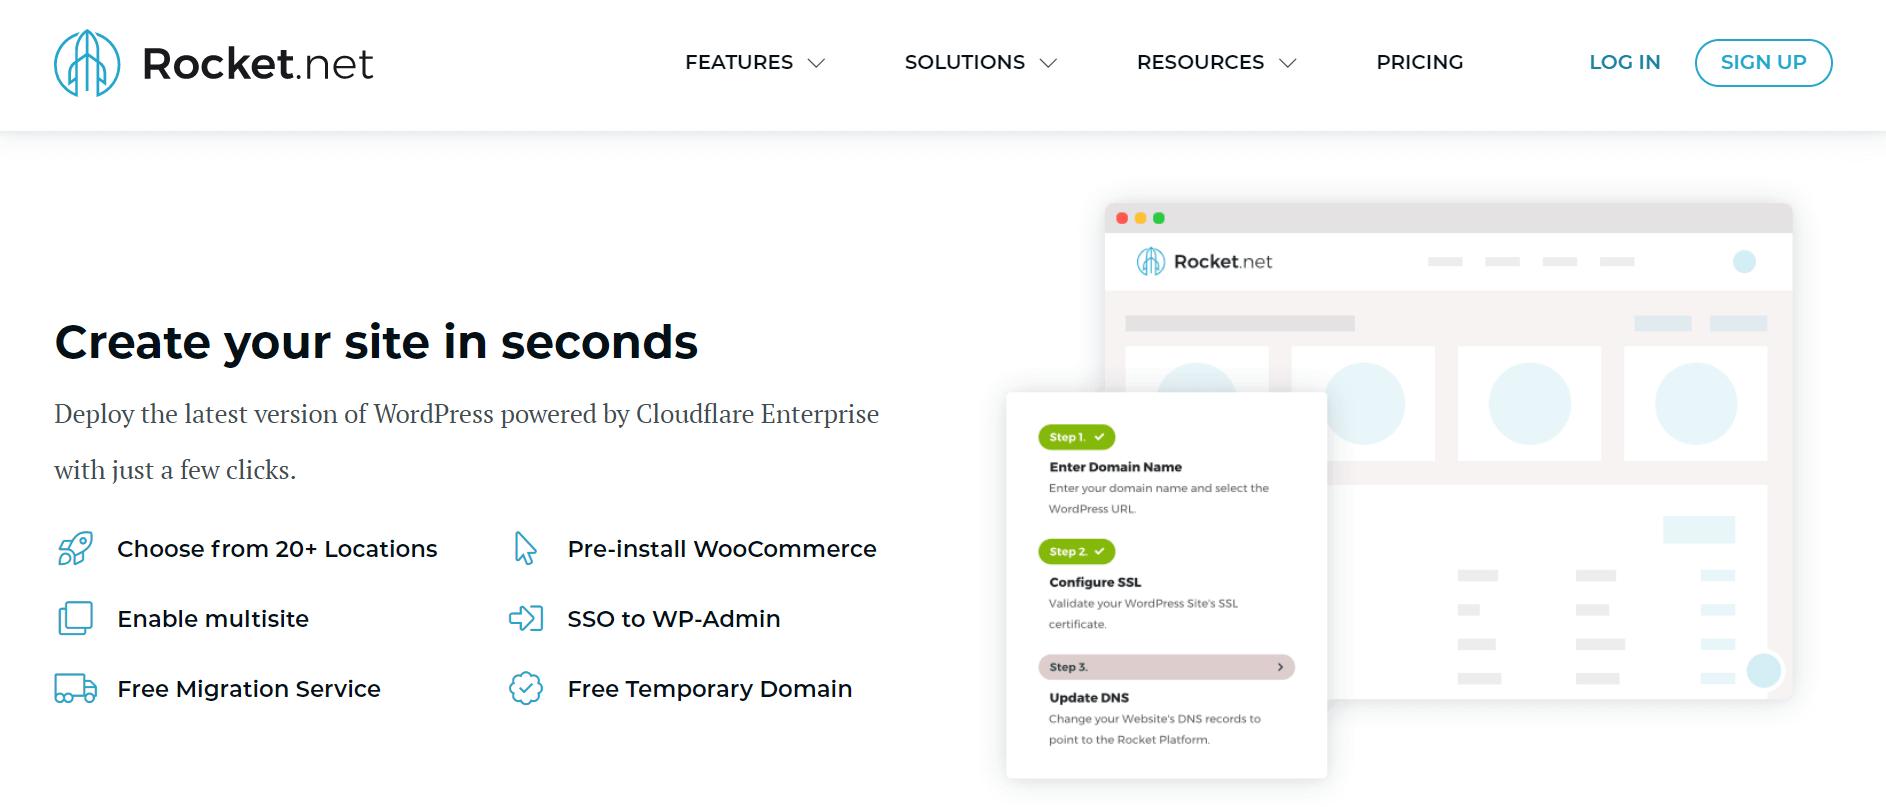 rocket.net wordpress managed hosting